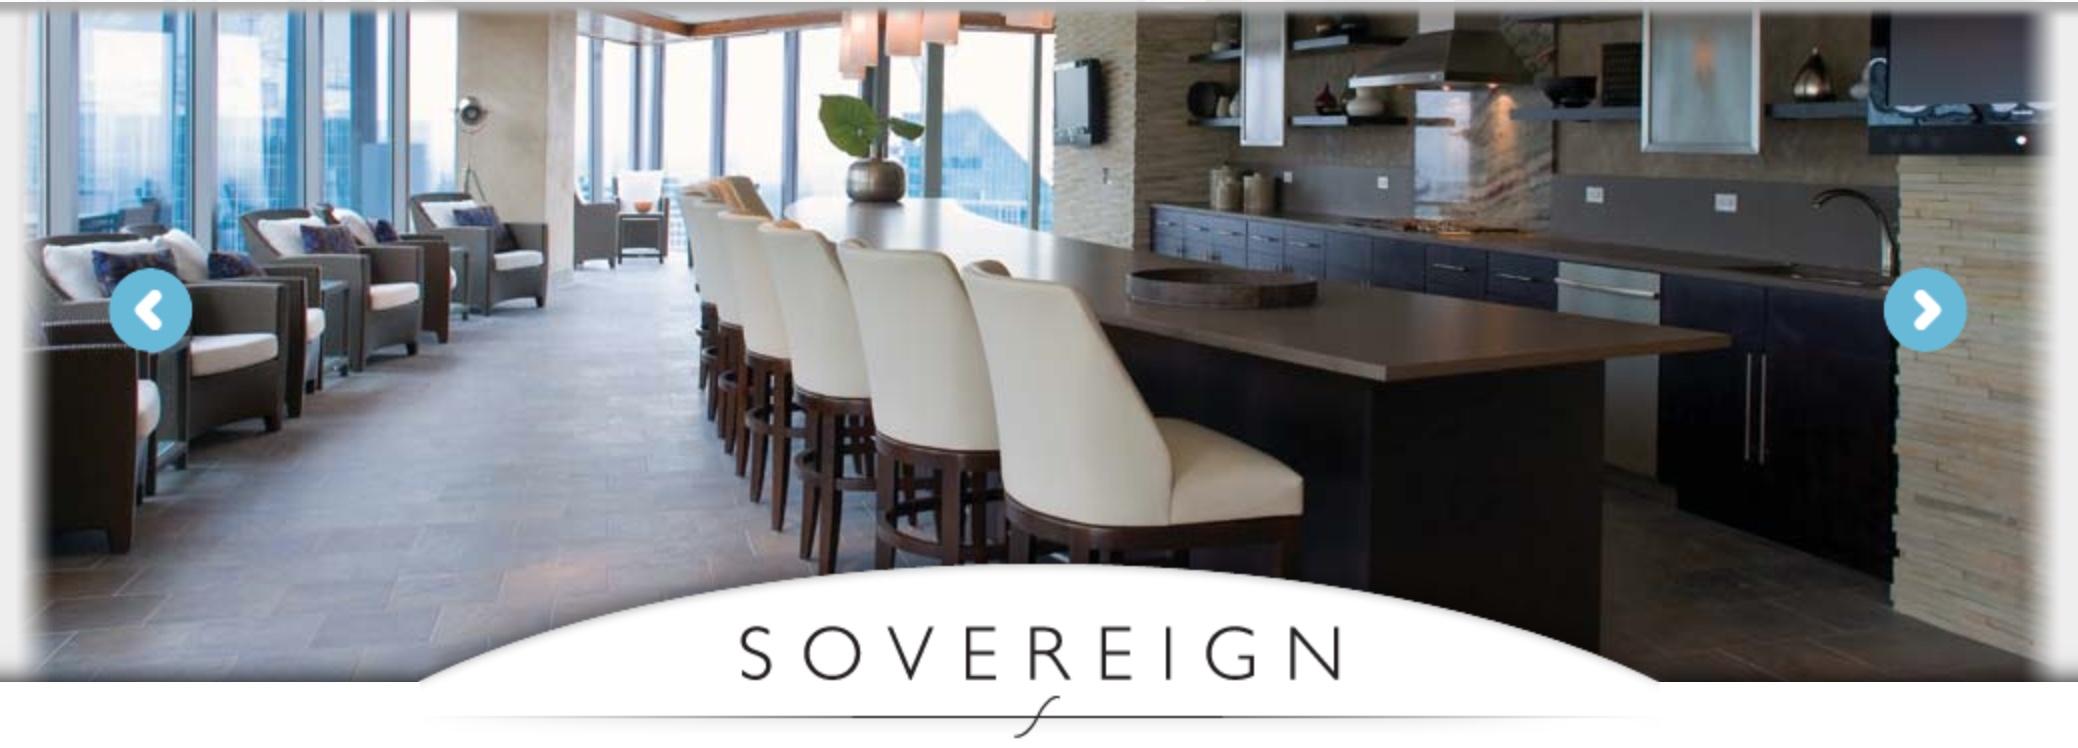 sovereign 3.jpeg